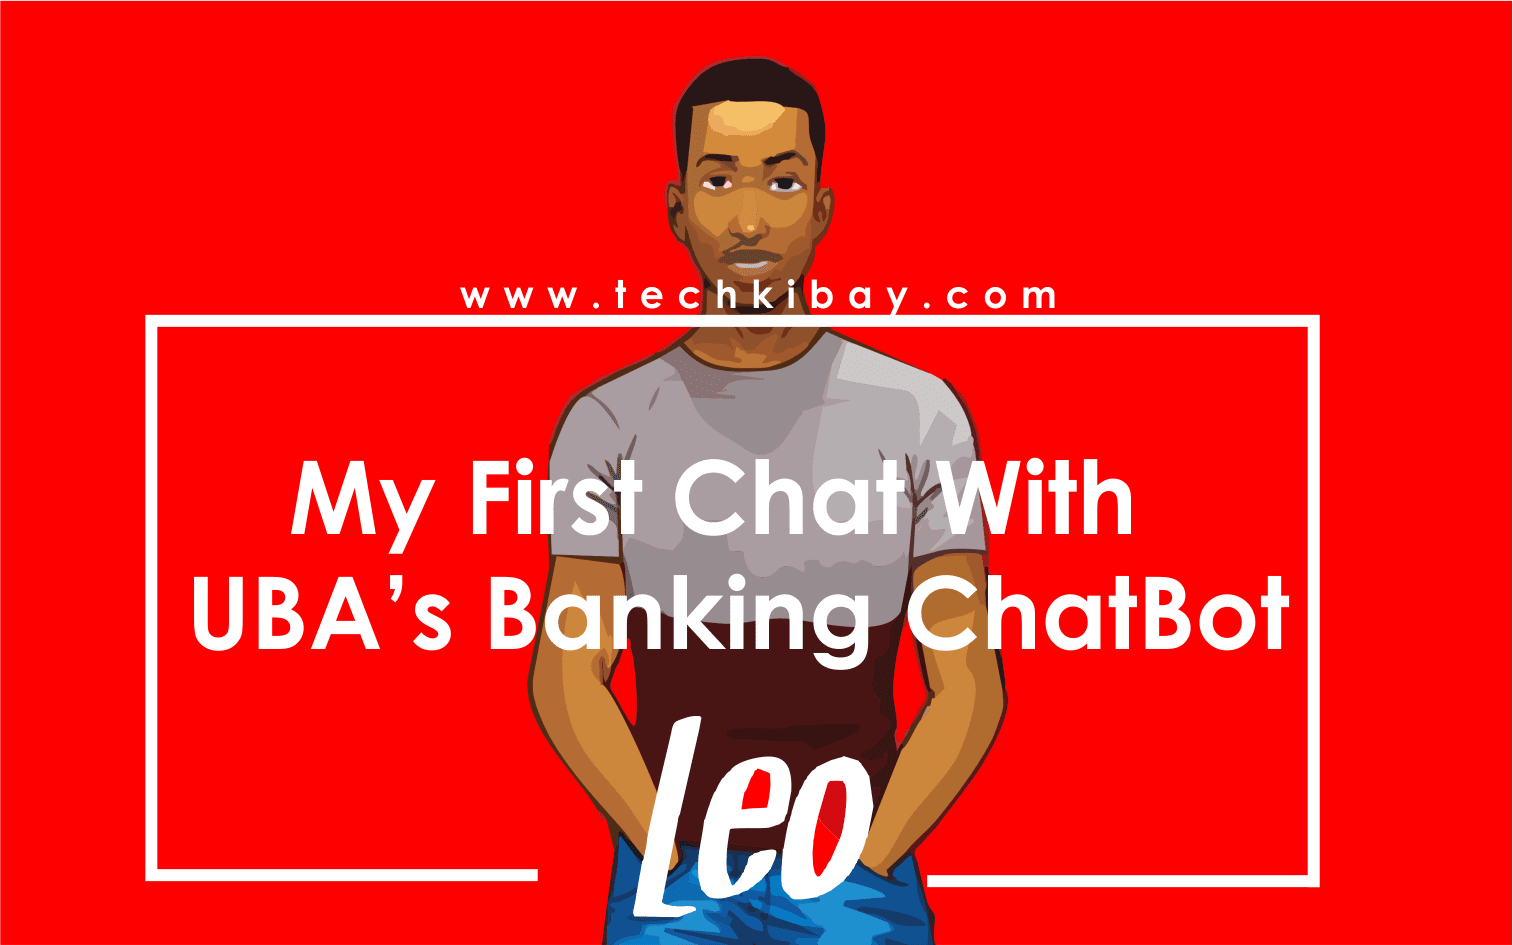 UBA-Banking-Chatbot-Leo